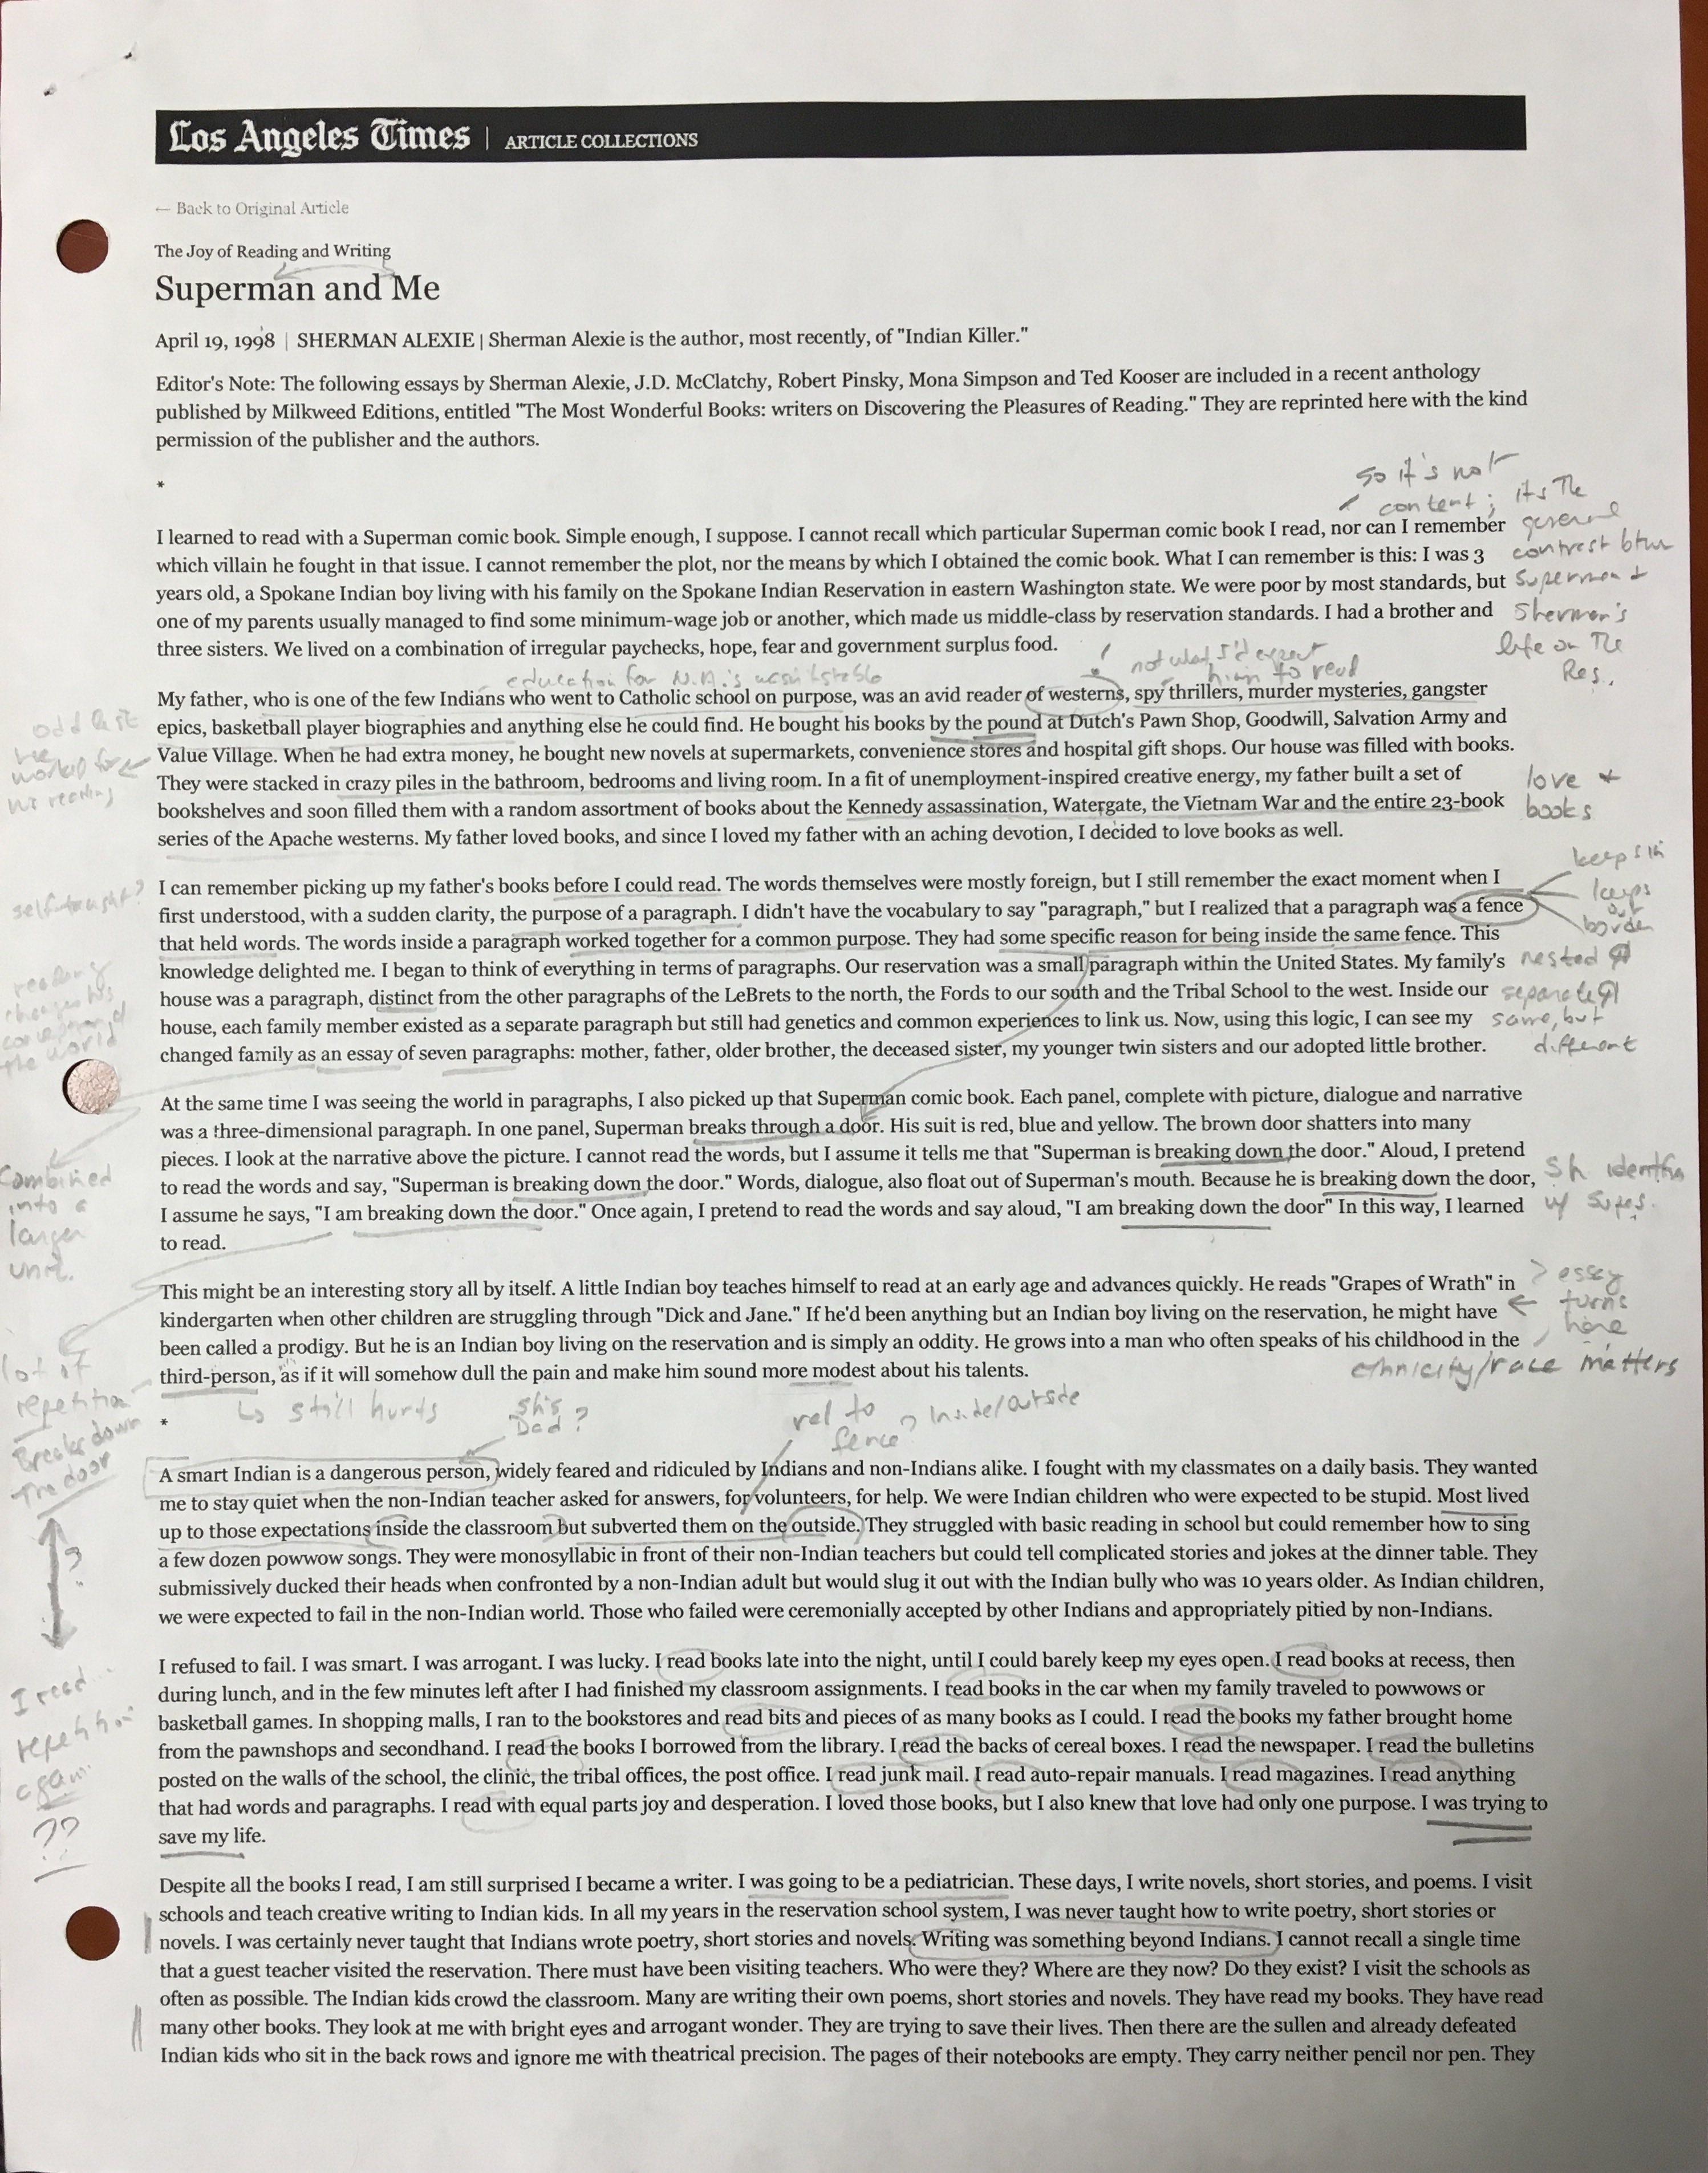 Job application letter sample for students photo 2